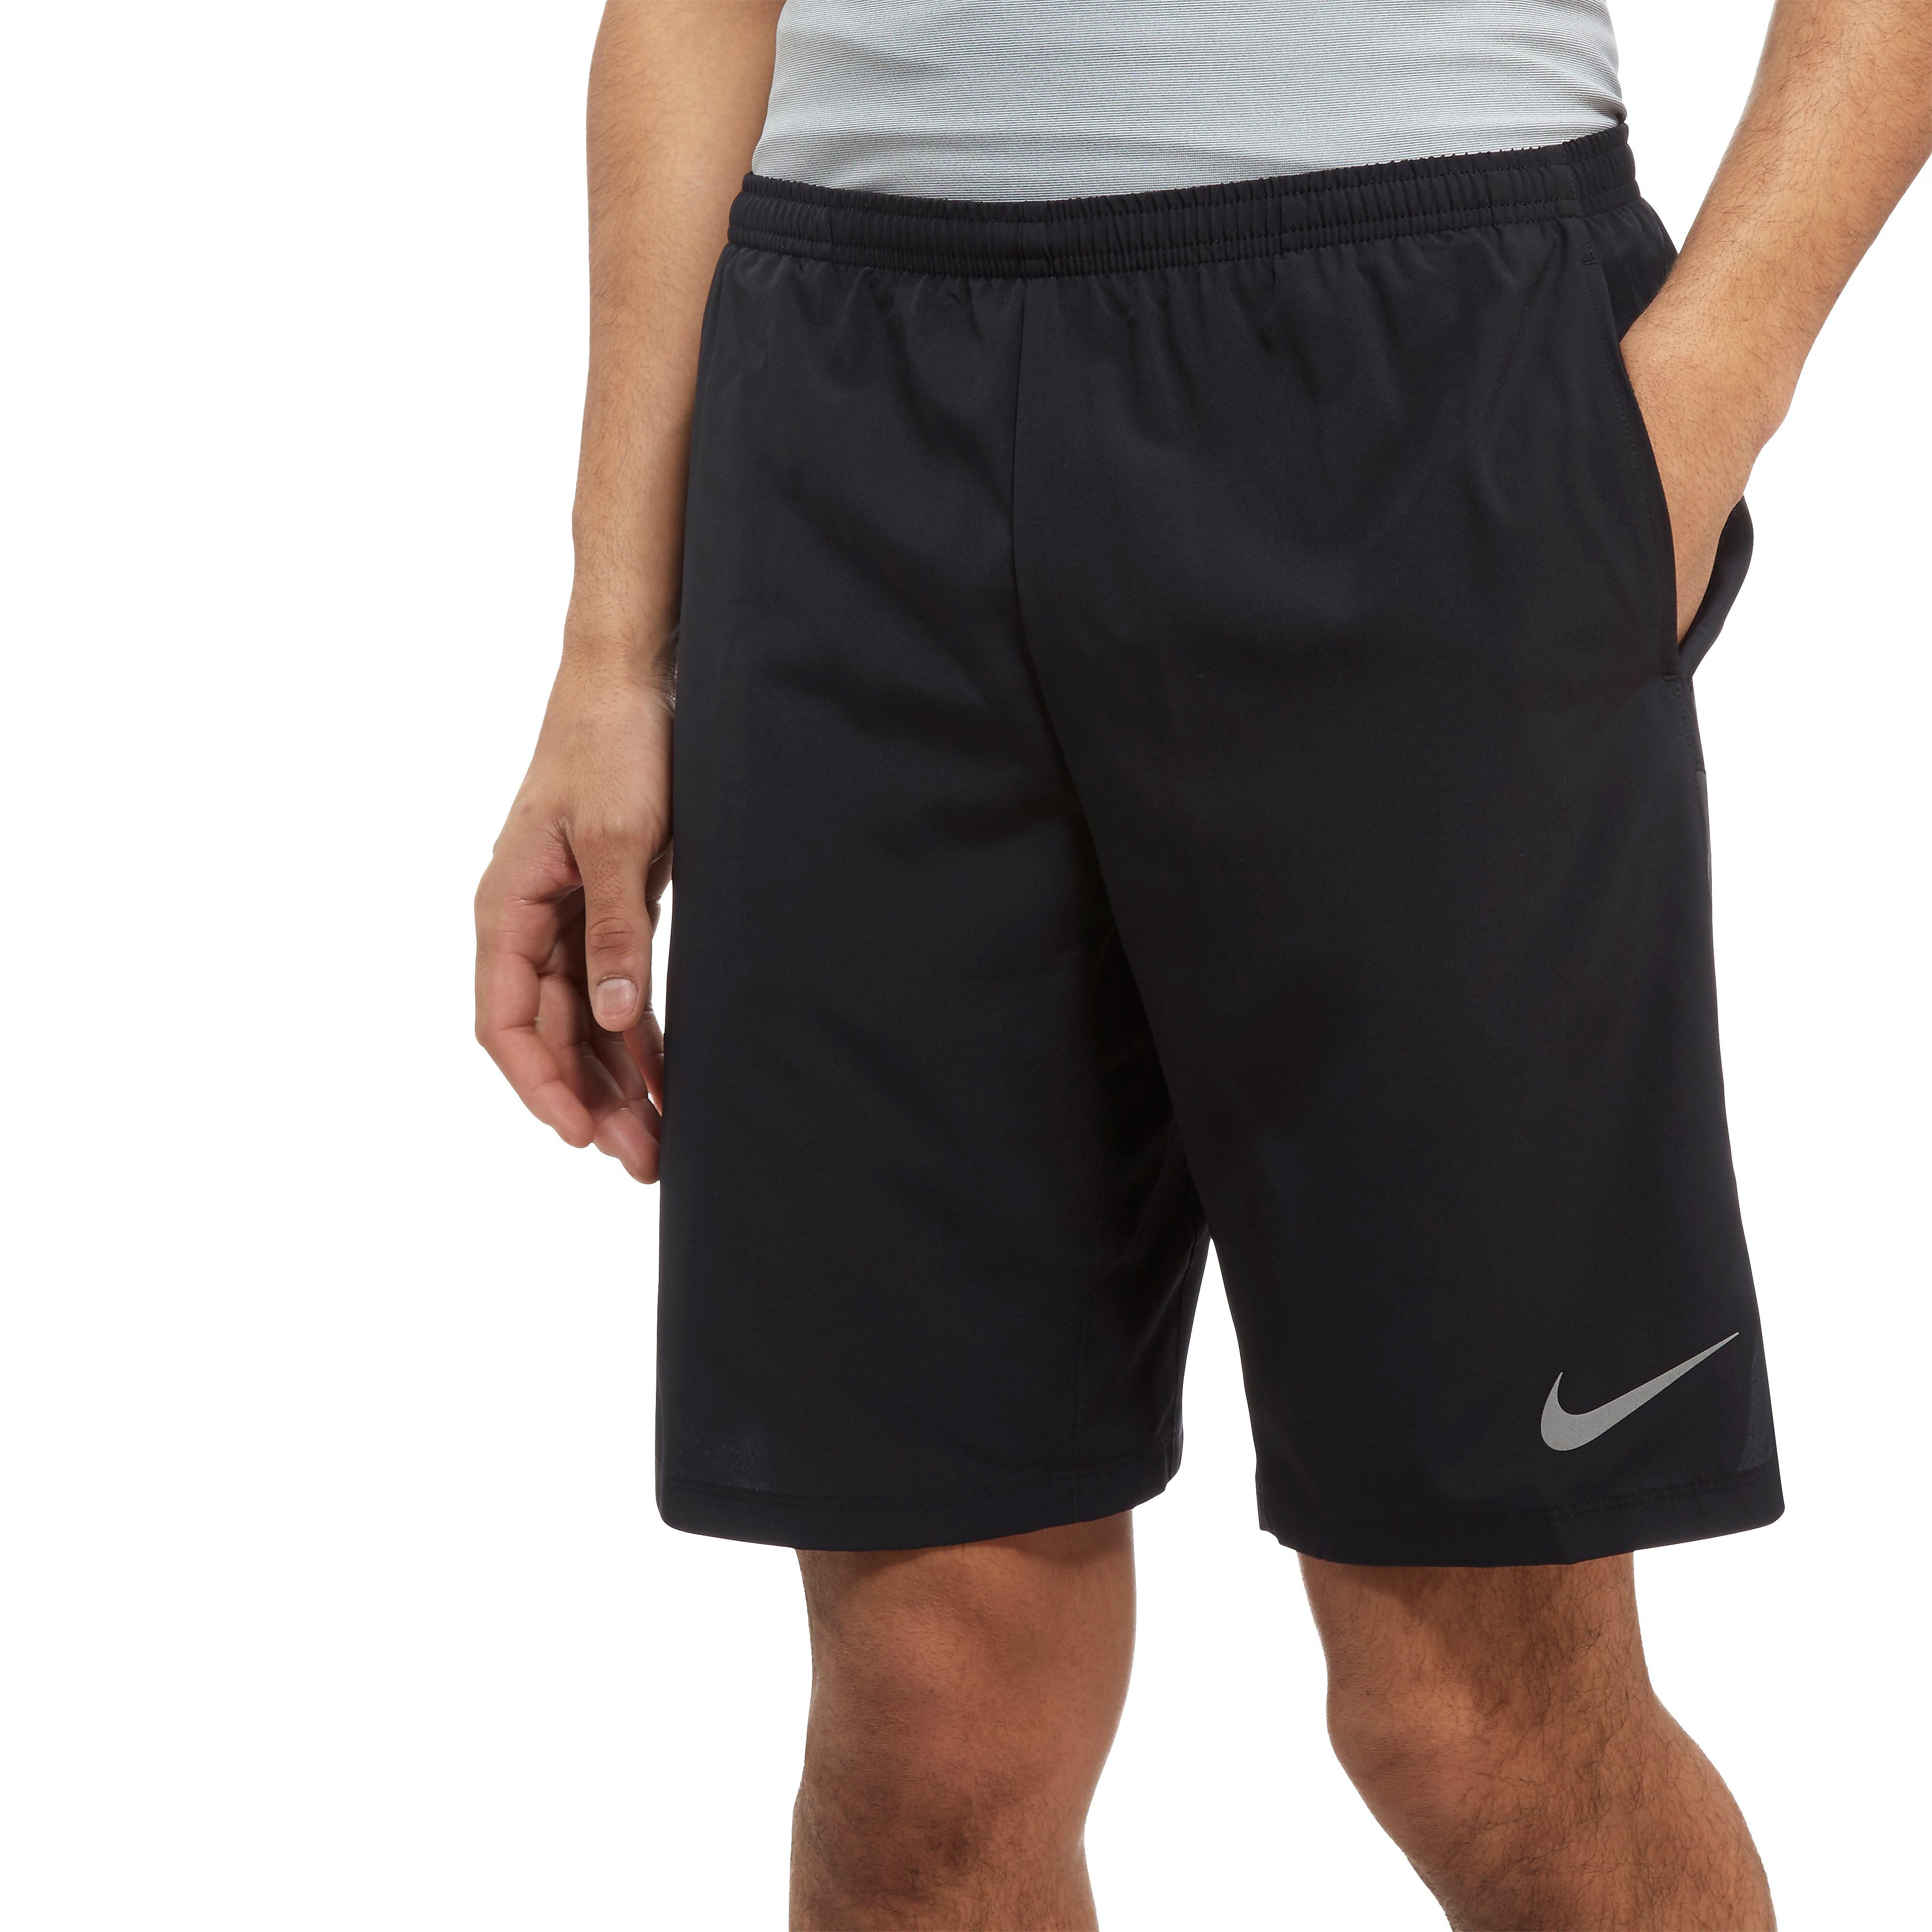 "Nike 9"" Challenge Men's Running Shorts"